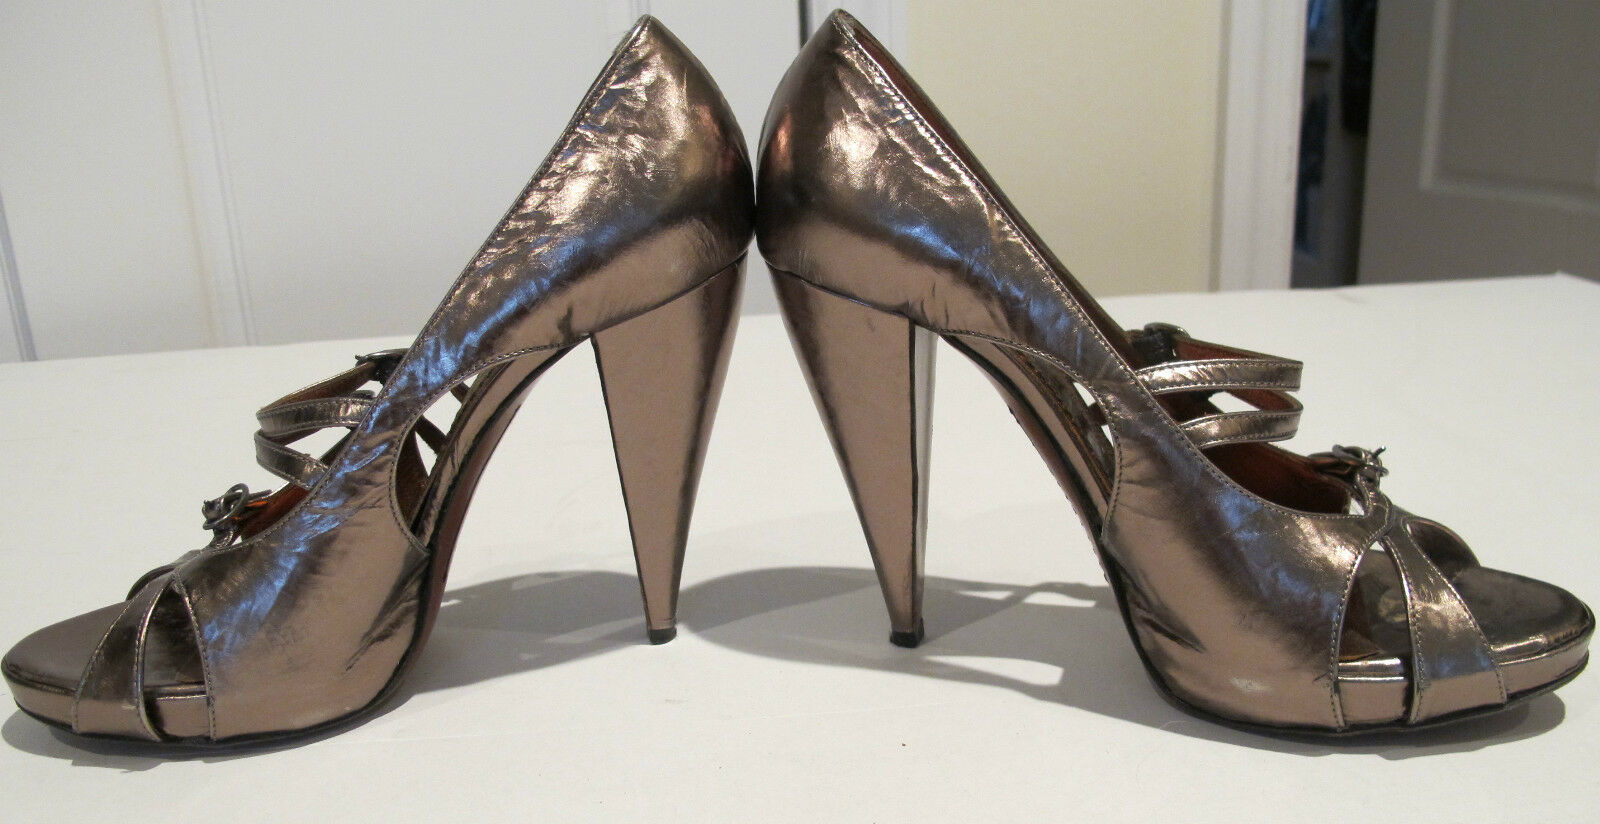 Jonathan Kelsey Chic Metallic Rose Gold Open Toe Cone Heel Pumps Größe 37